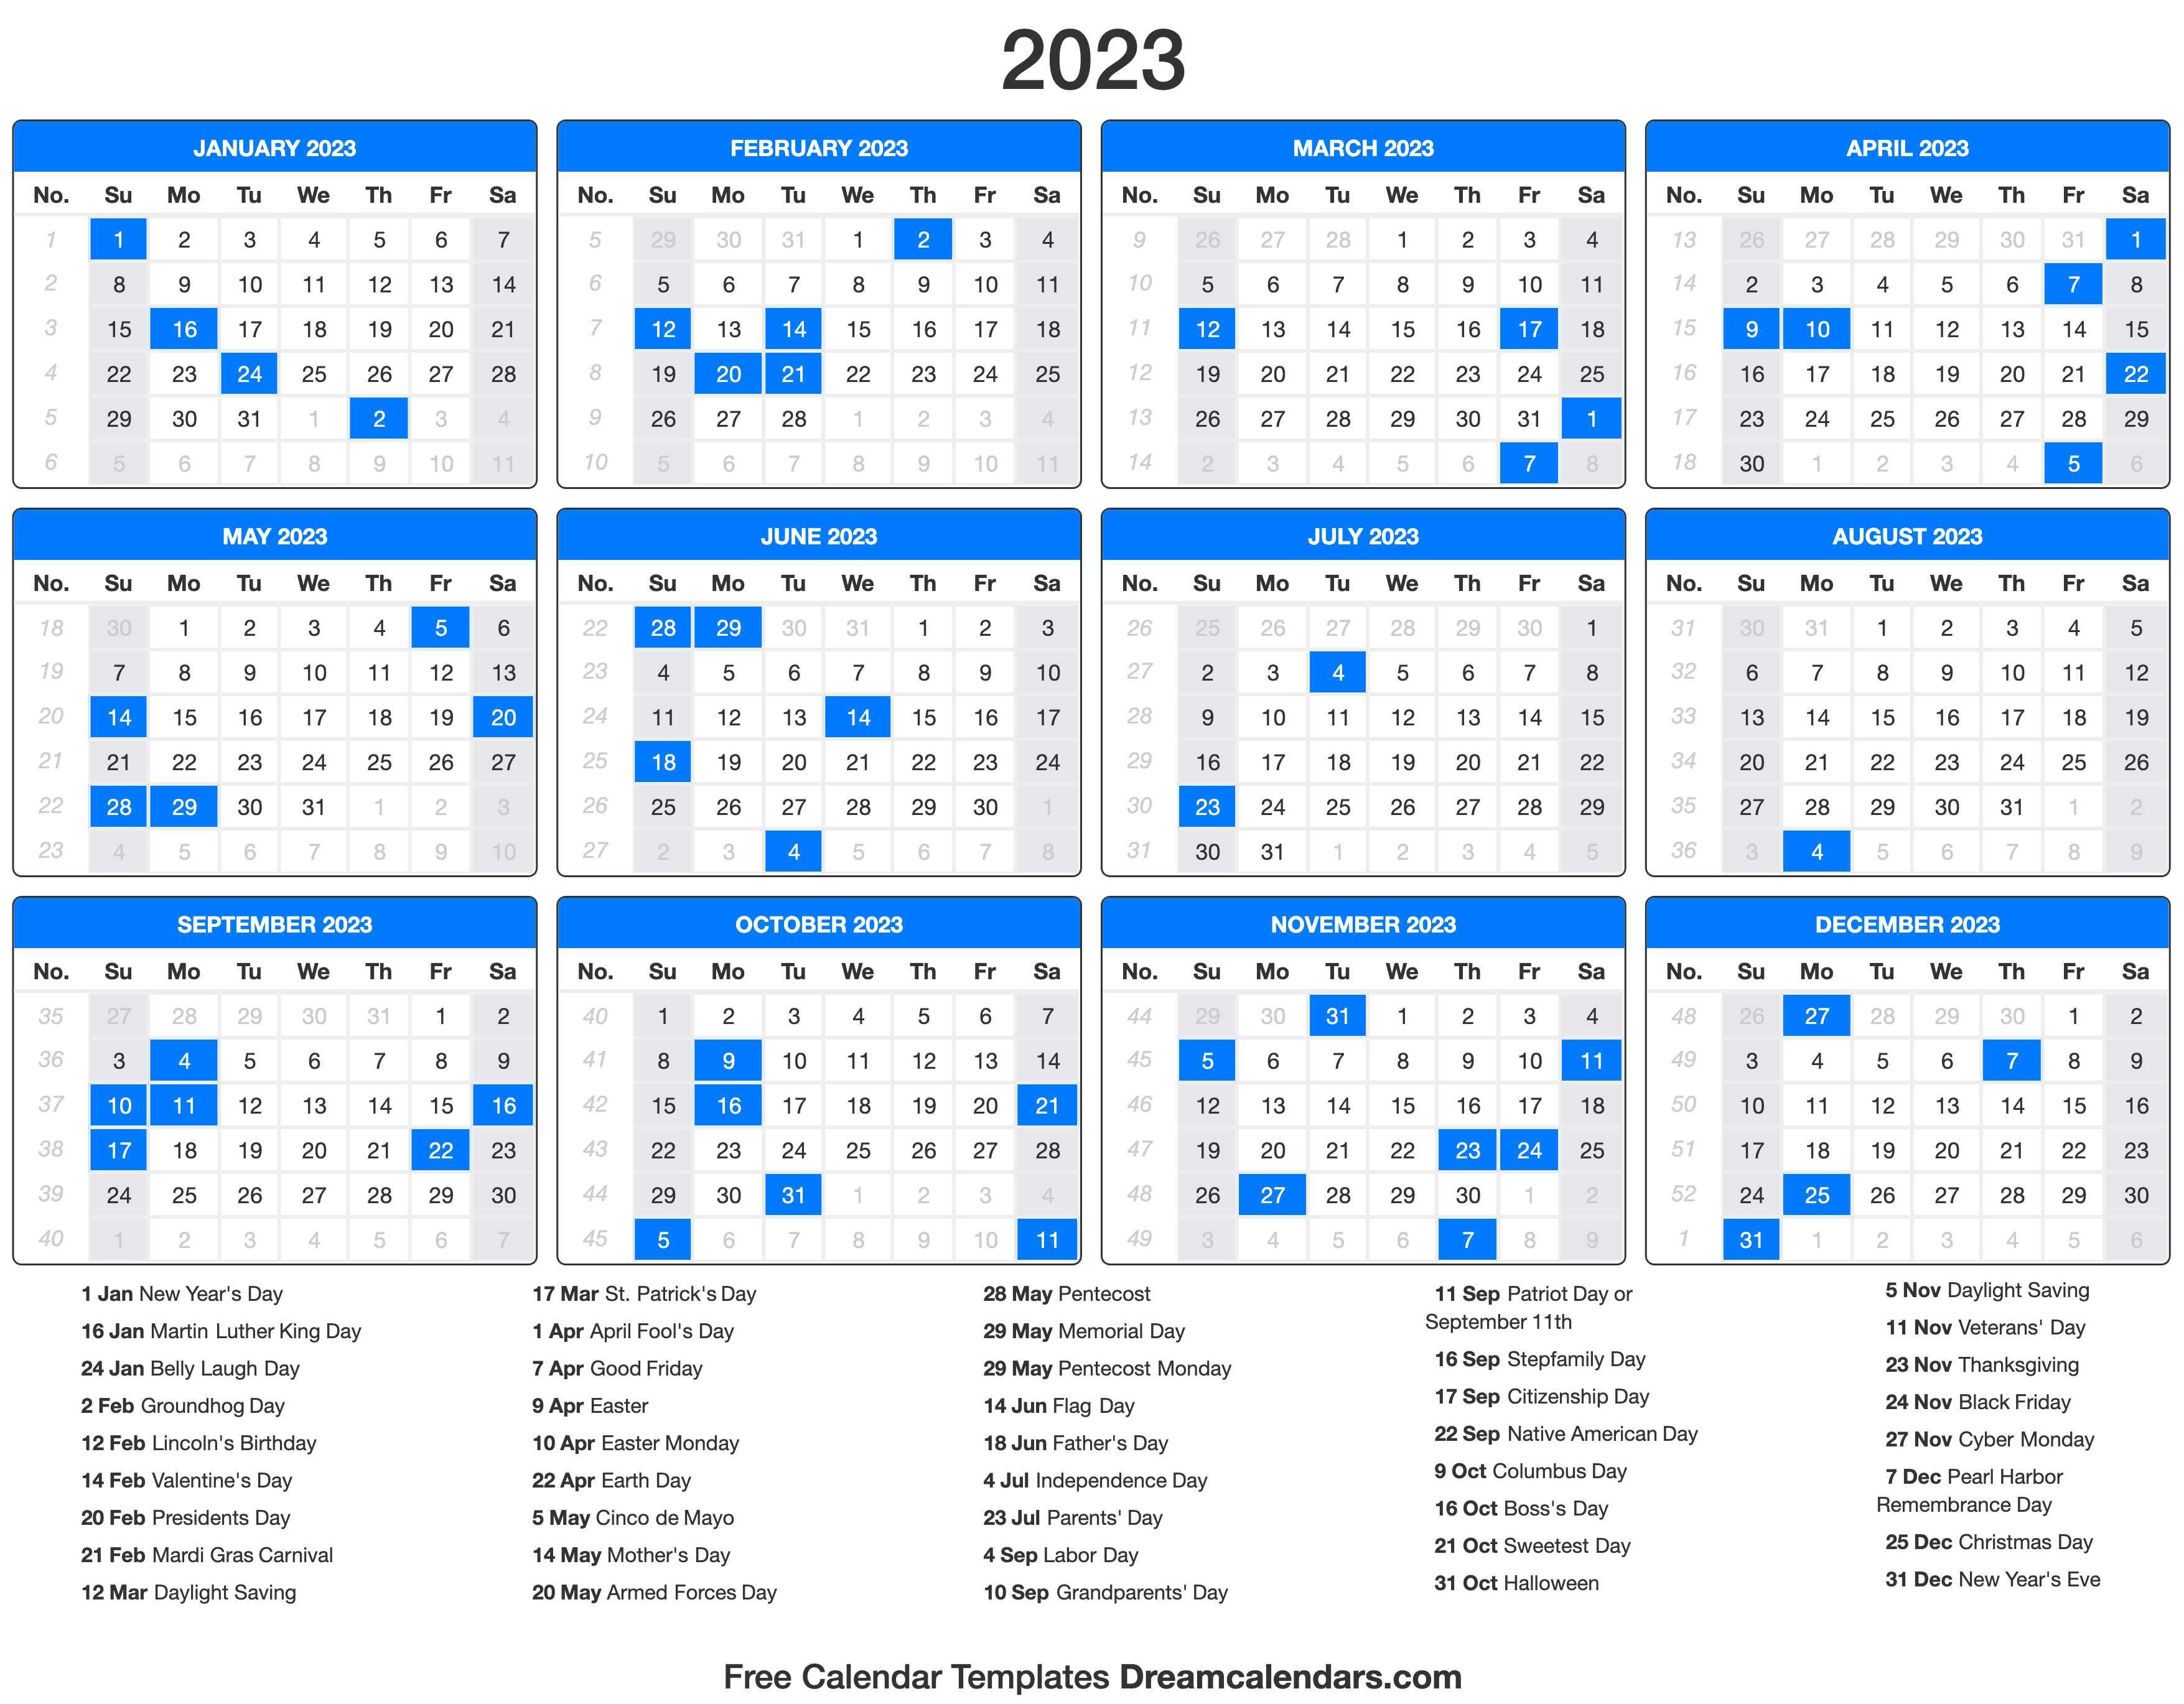 2022 And 2023 Calendar With Holidays.2023 Calendar